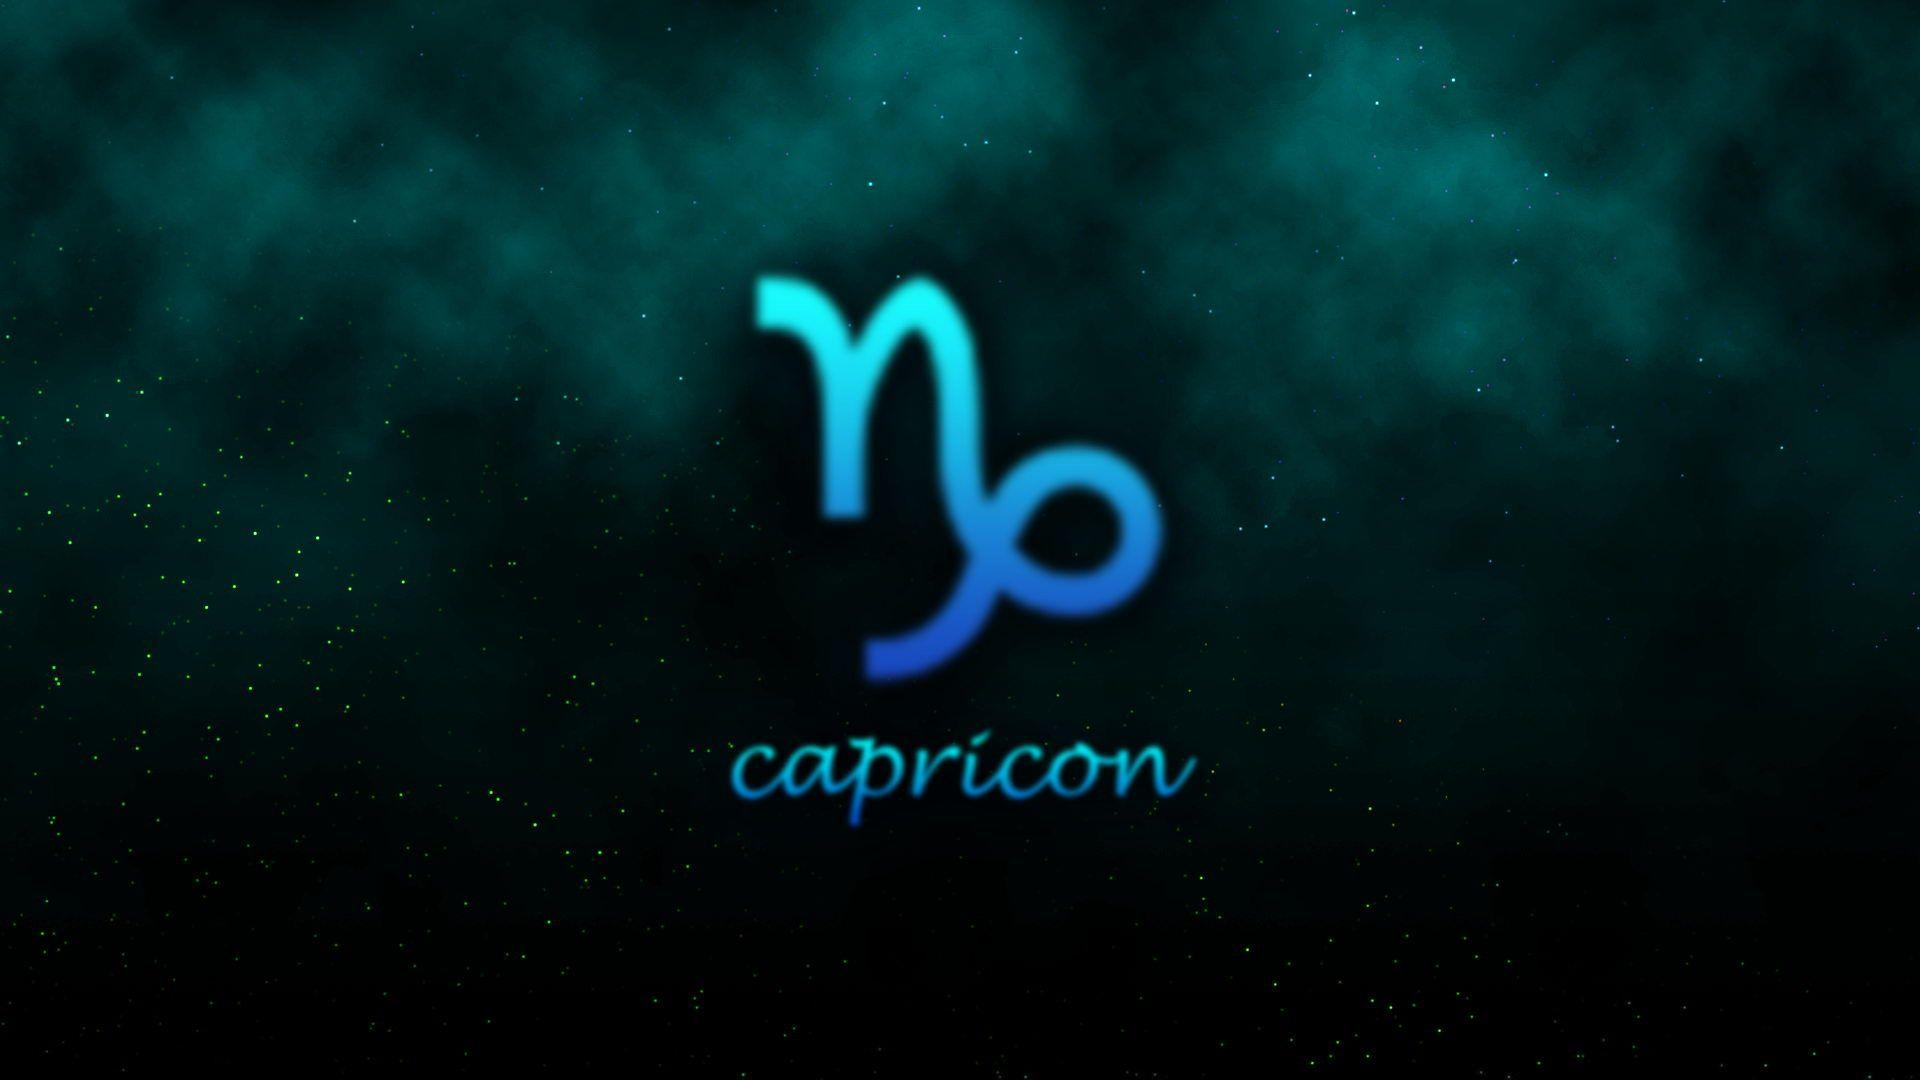 Capricorn Wallpaper